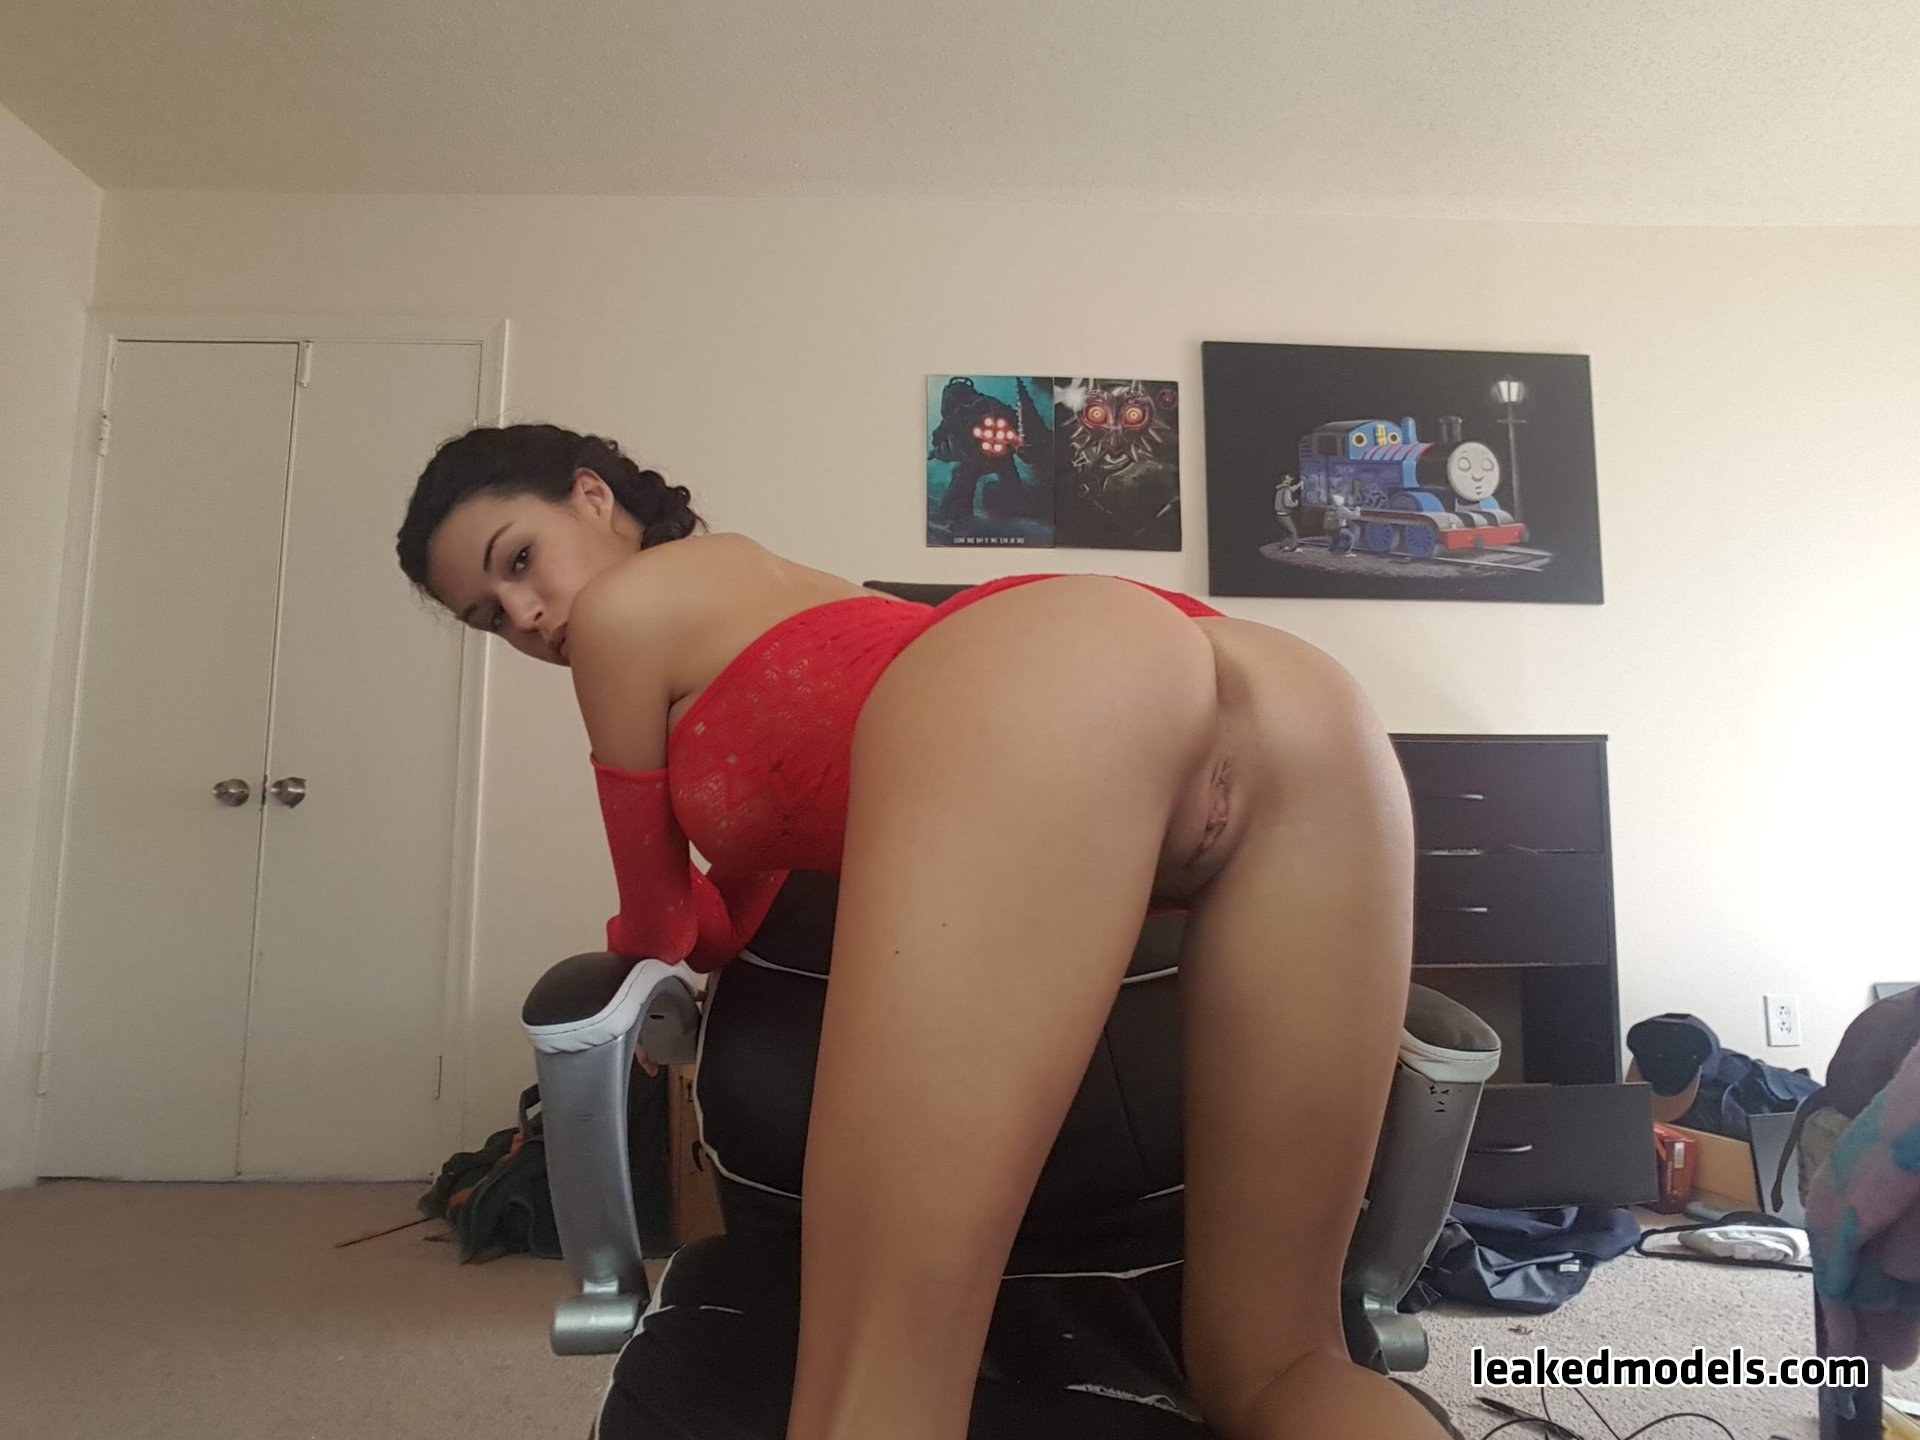 Anais – anaislovesyou – authenticallyanais Patreon Nude Leaks (28 Photos)